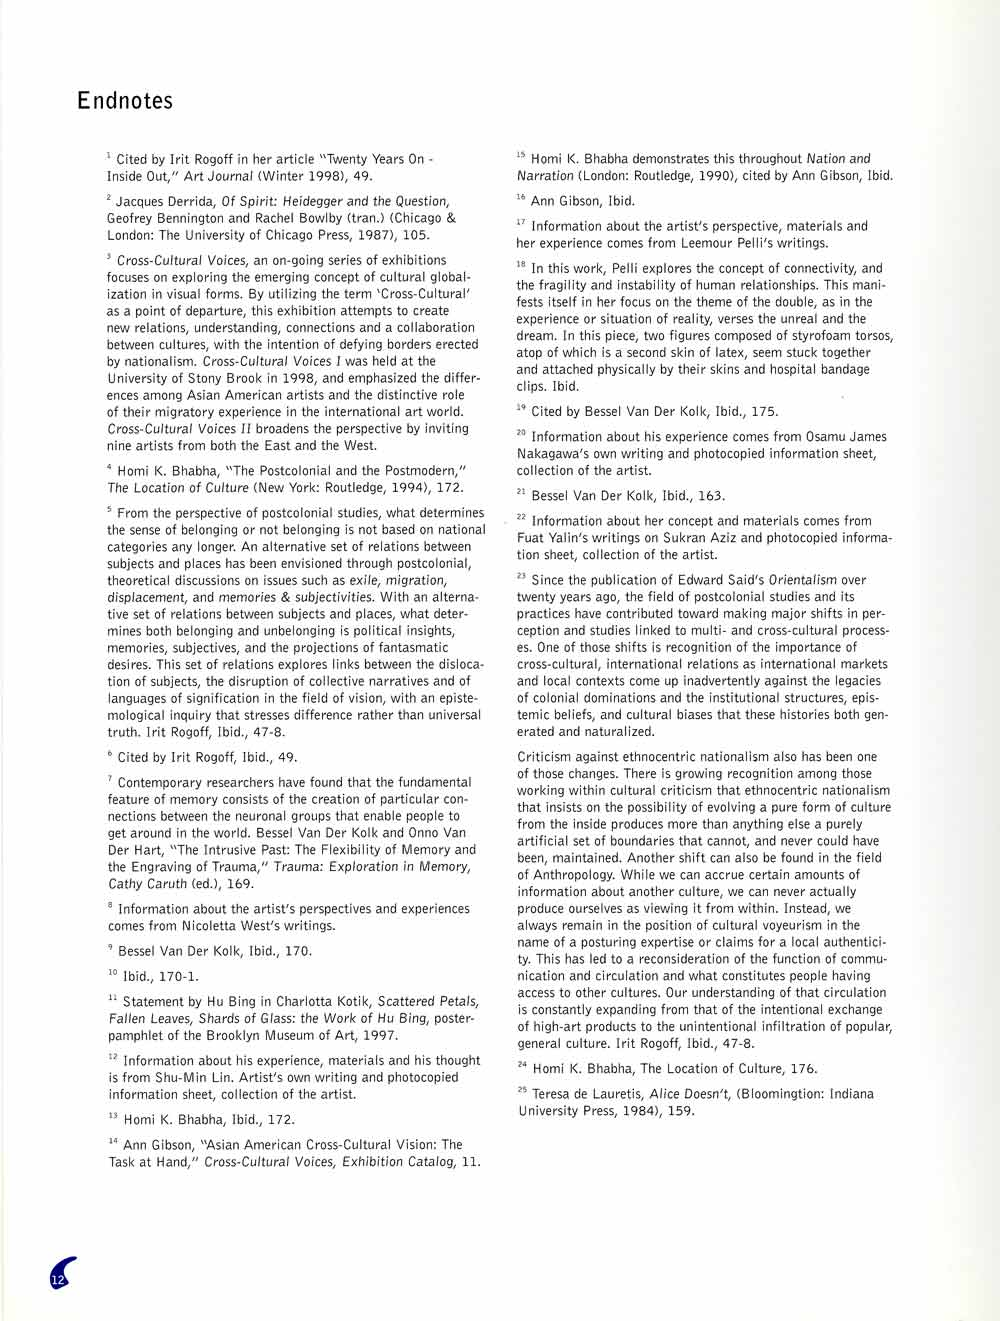 Cross-Cultural Voices II, exhibition catalog, pg 9